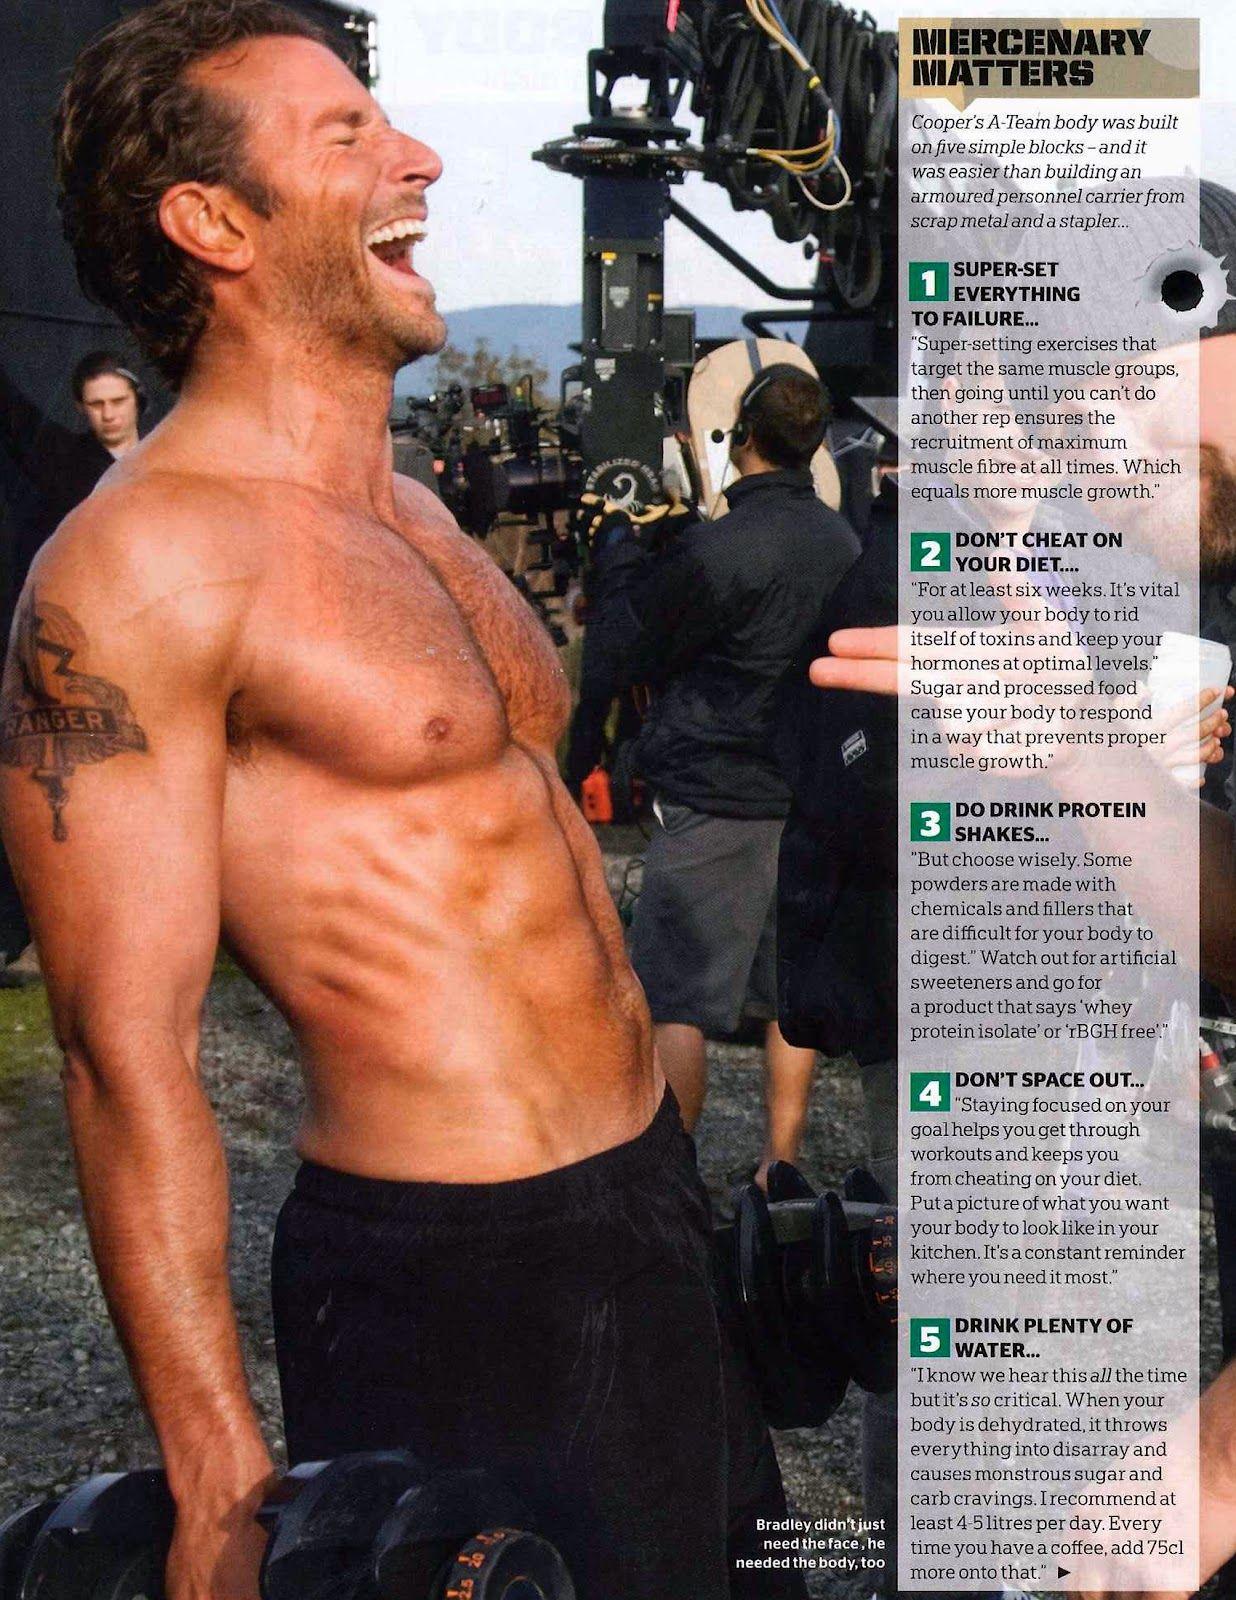 Bradley Cooper's Workout | garrettKIMBALL's body, mind, soul things